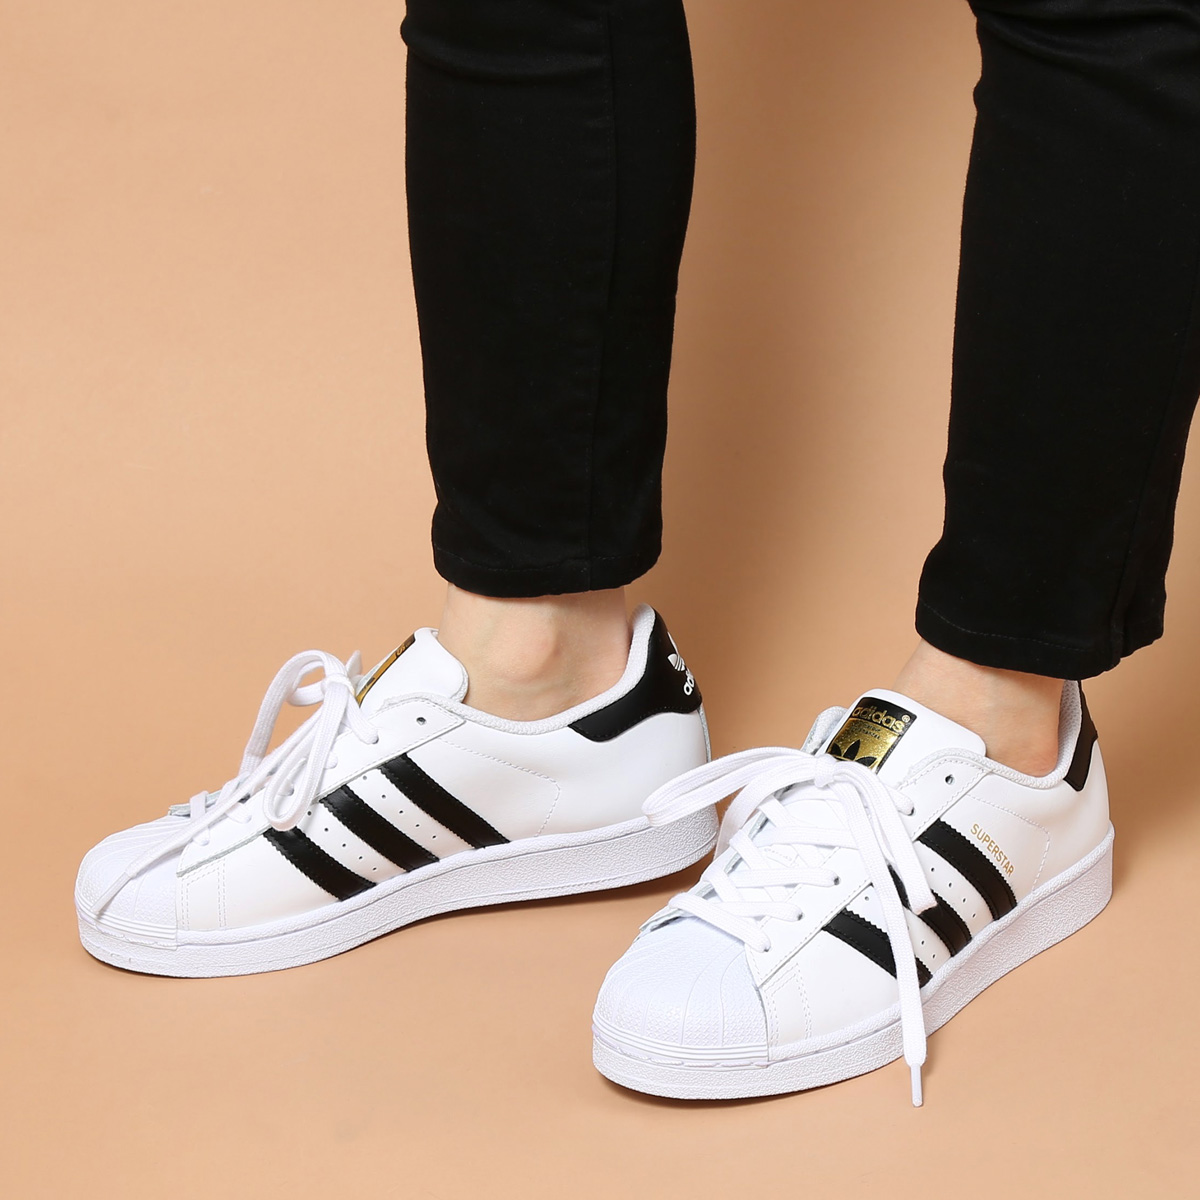 L'atmos Rosa Rakuten Mercato Superstar Globale: Adidas Originali Superstar Mercato W 93f729